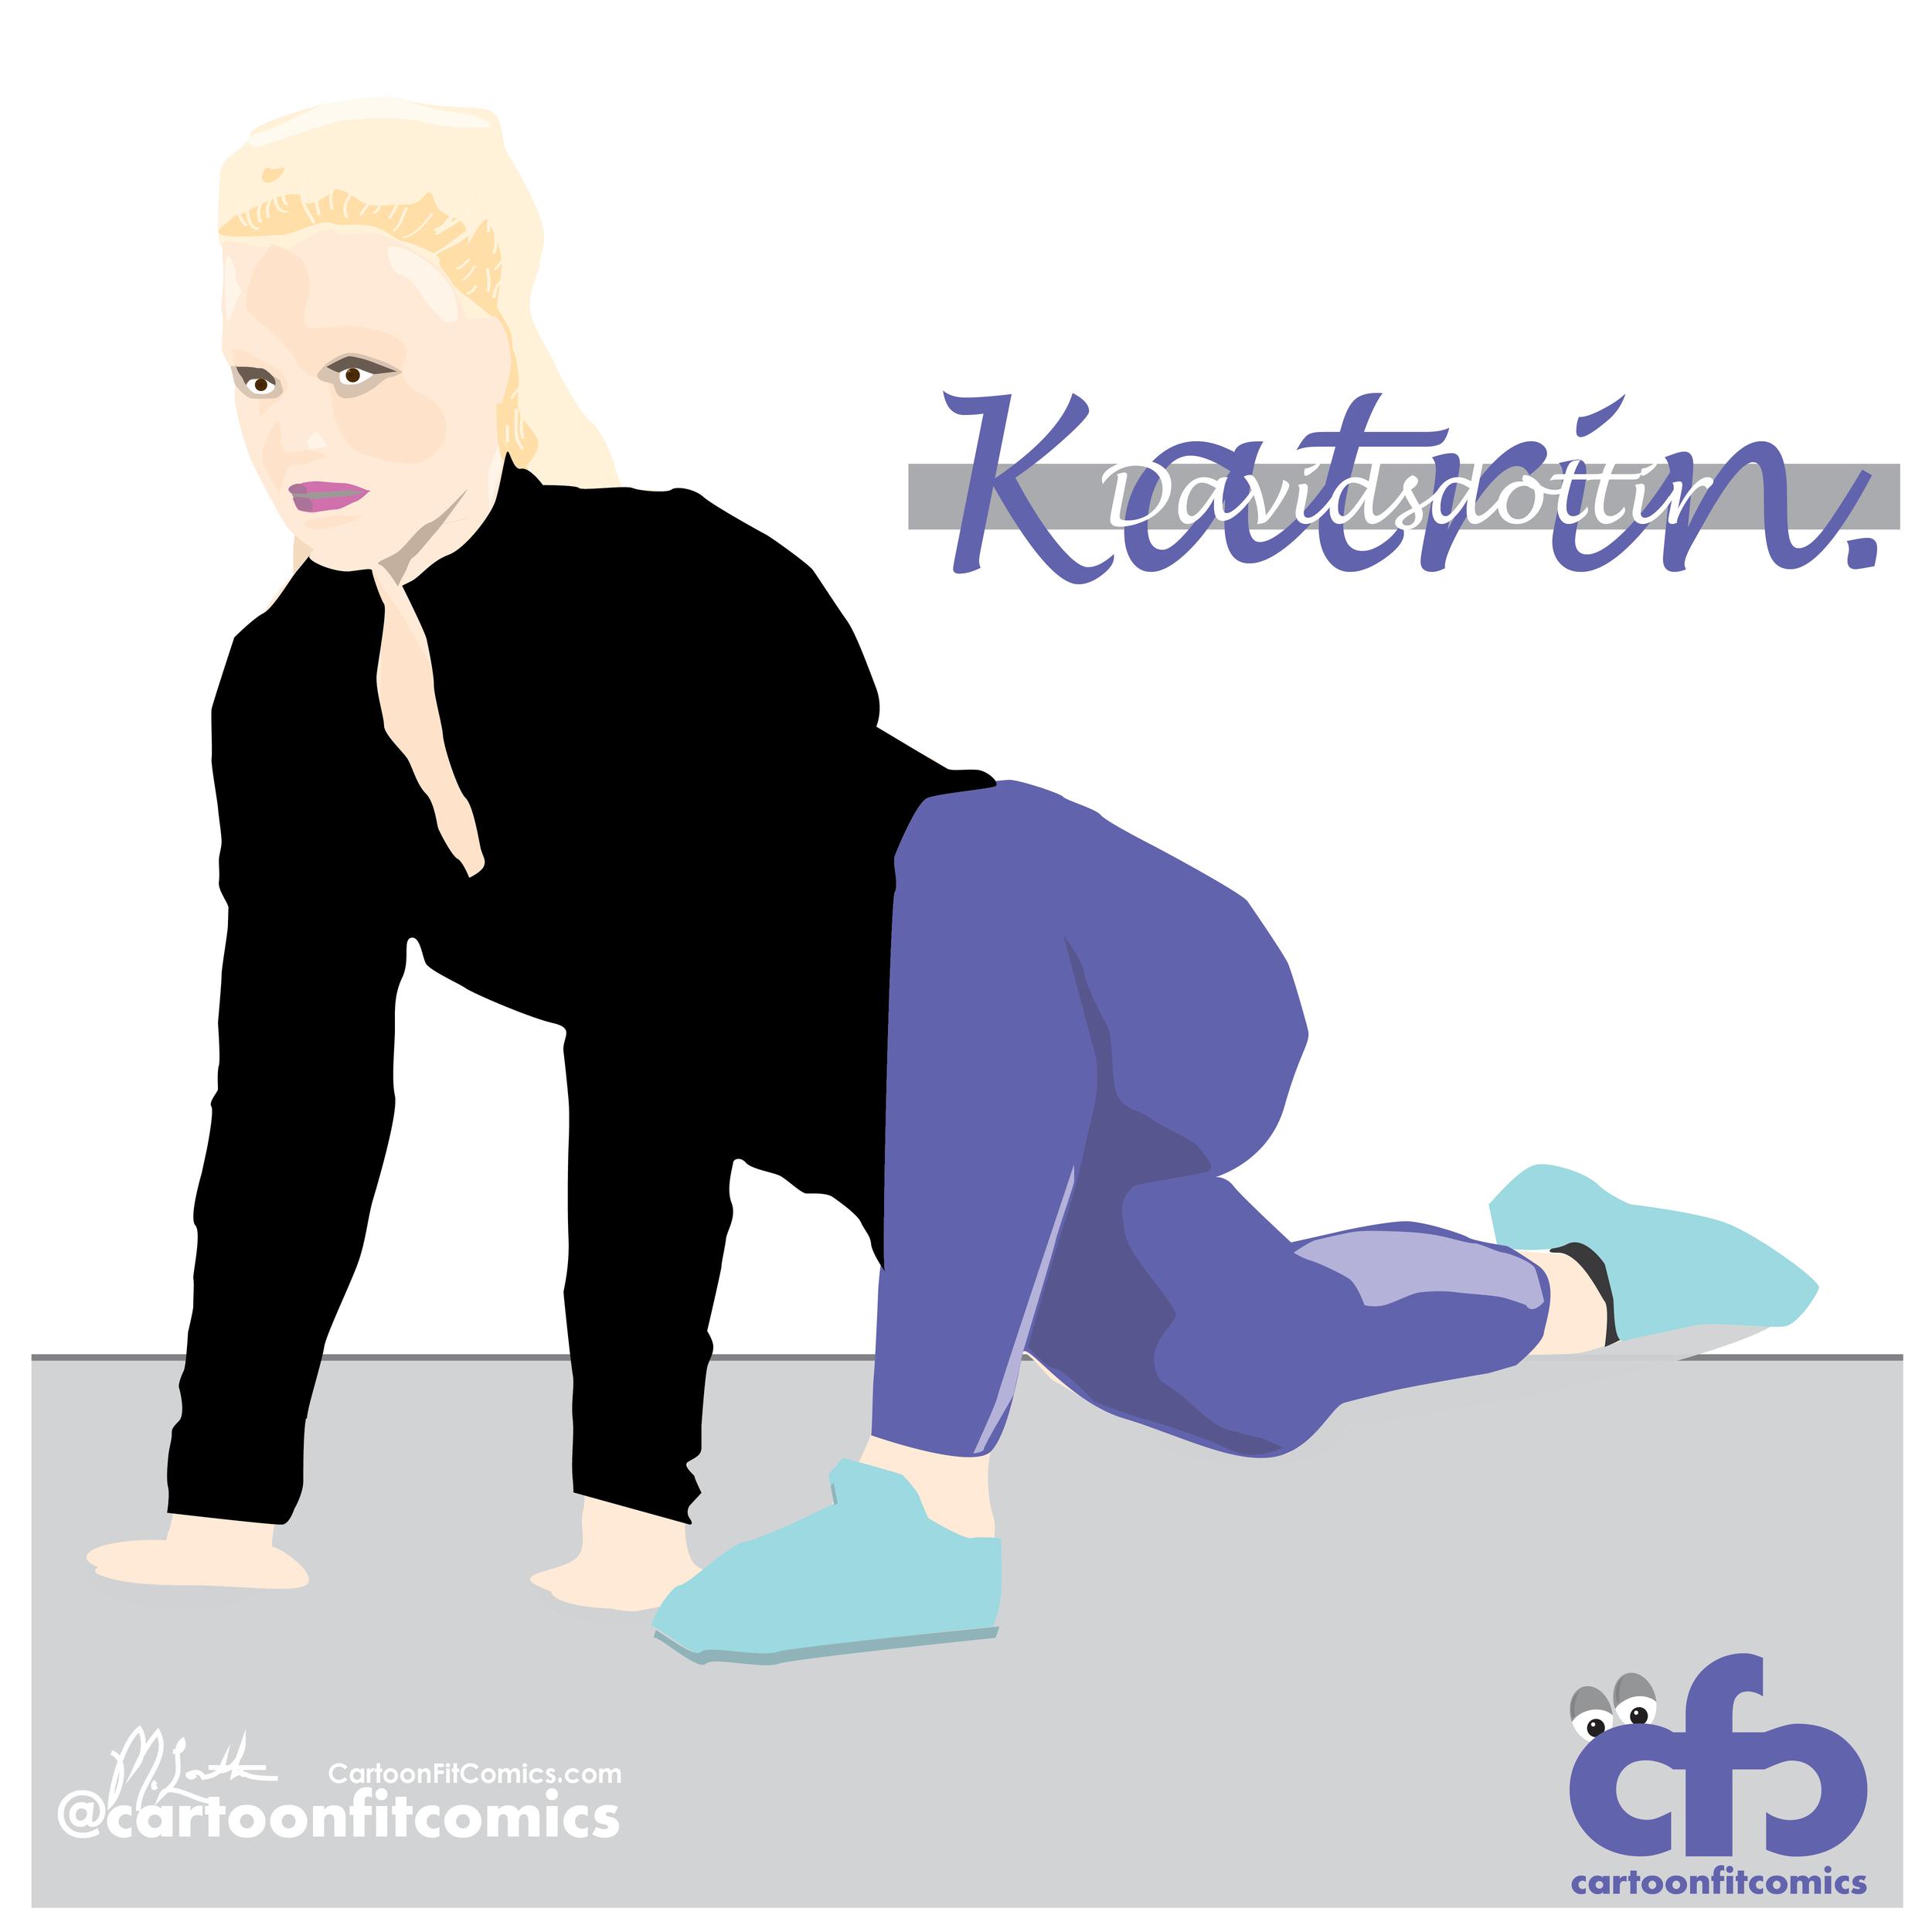 athlete tribute - Katrin-01.png